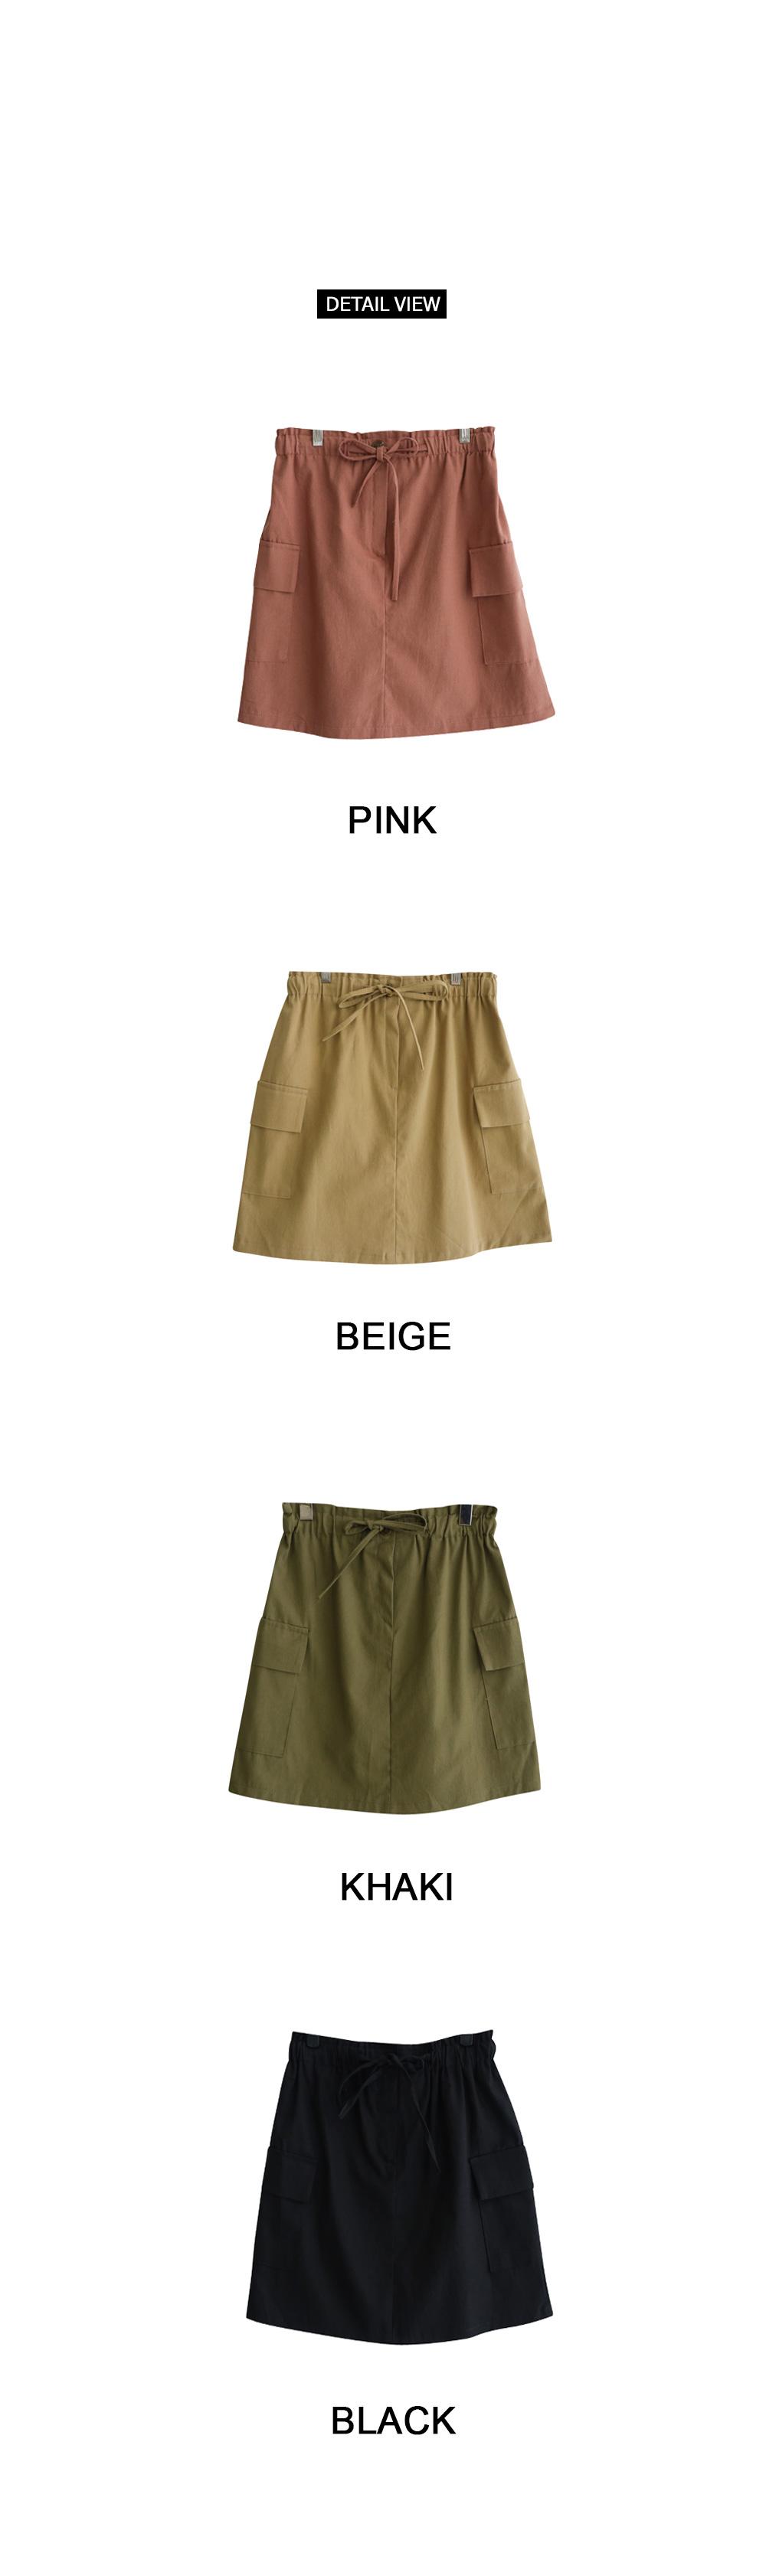 Vegetable biscuit skirt